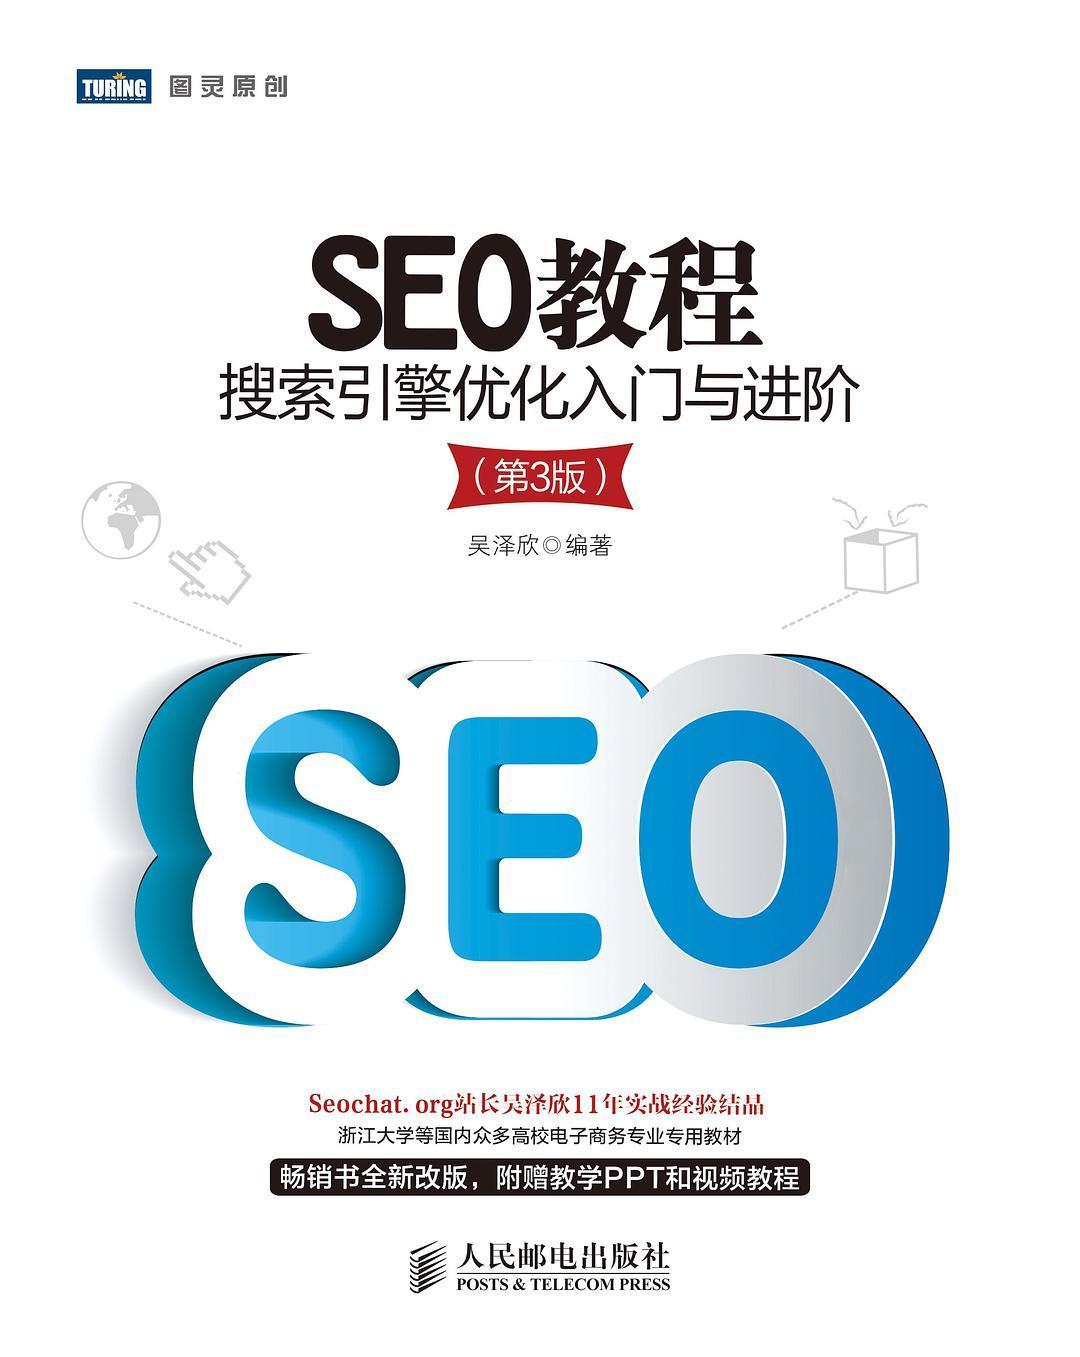 seo教程搜索引擎优化入门与进阶第3版